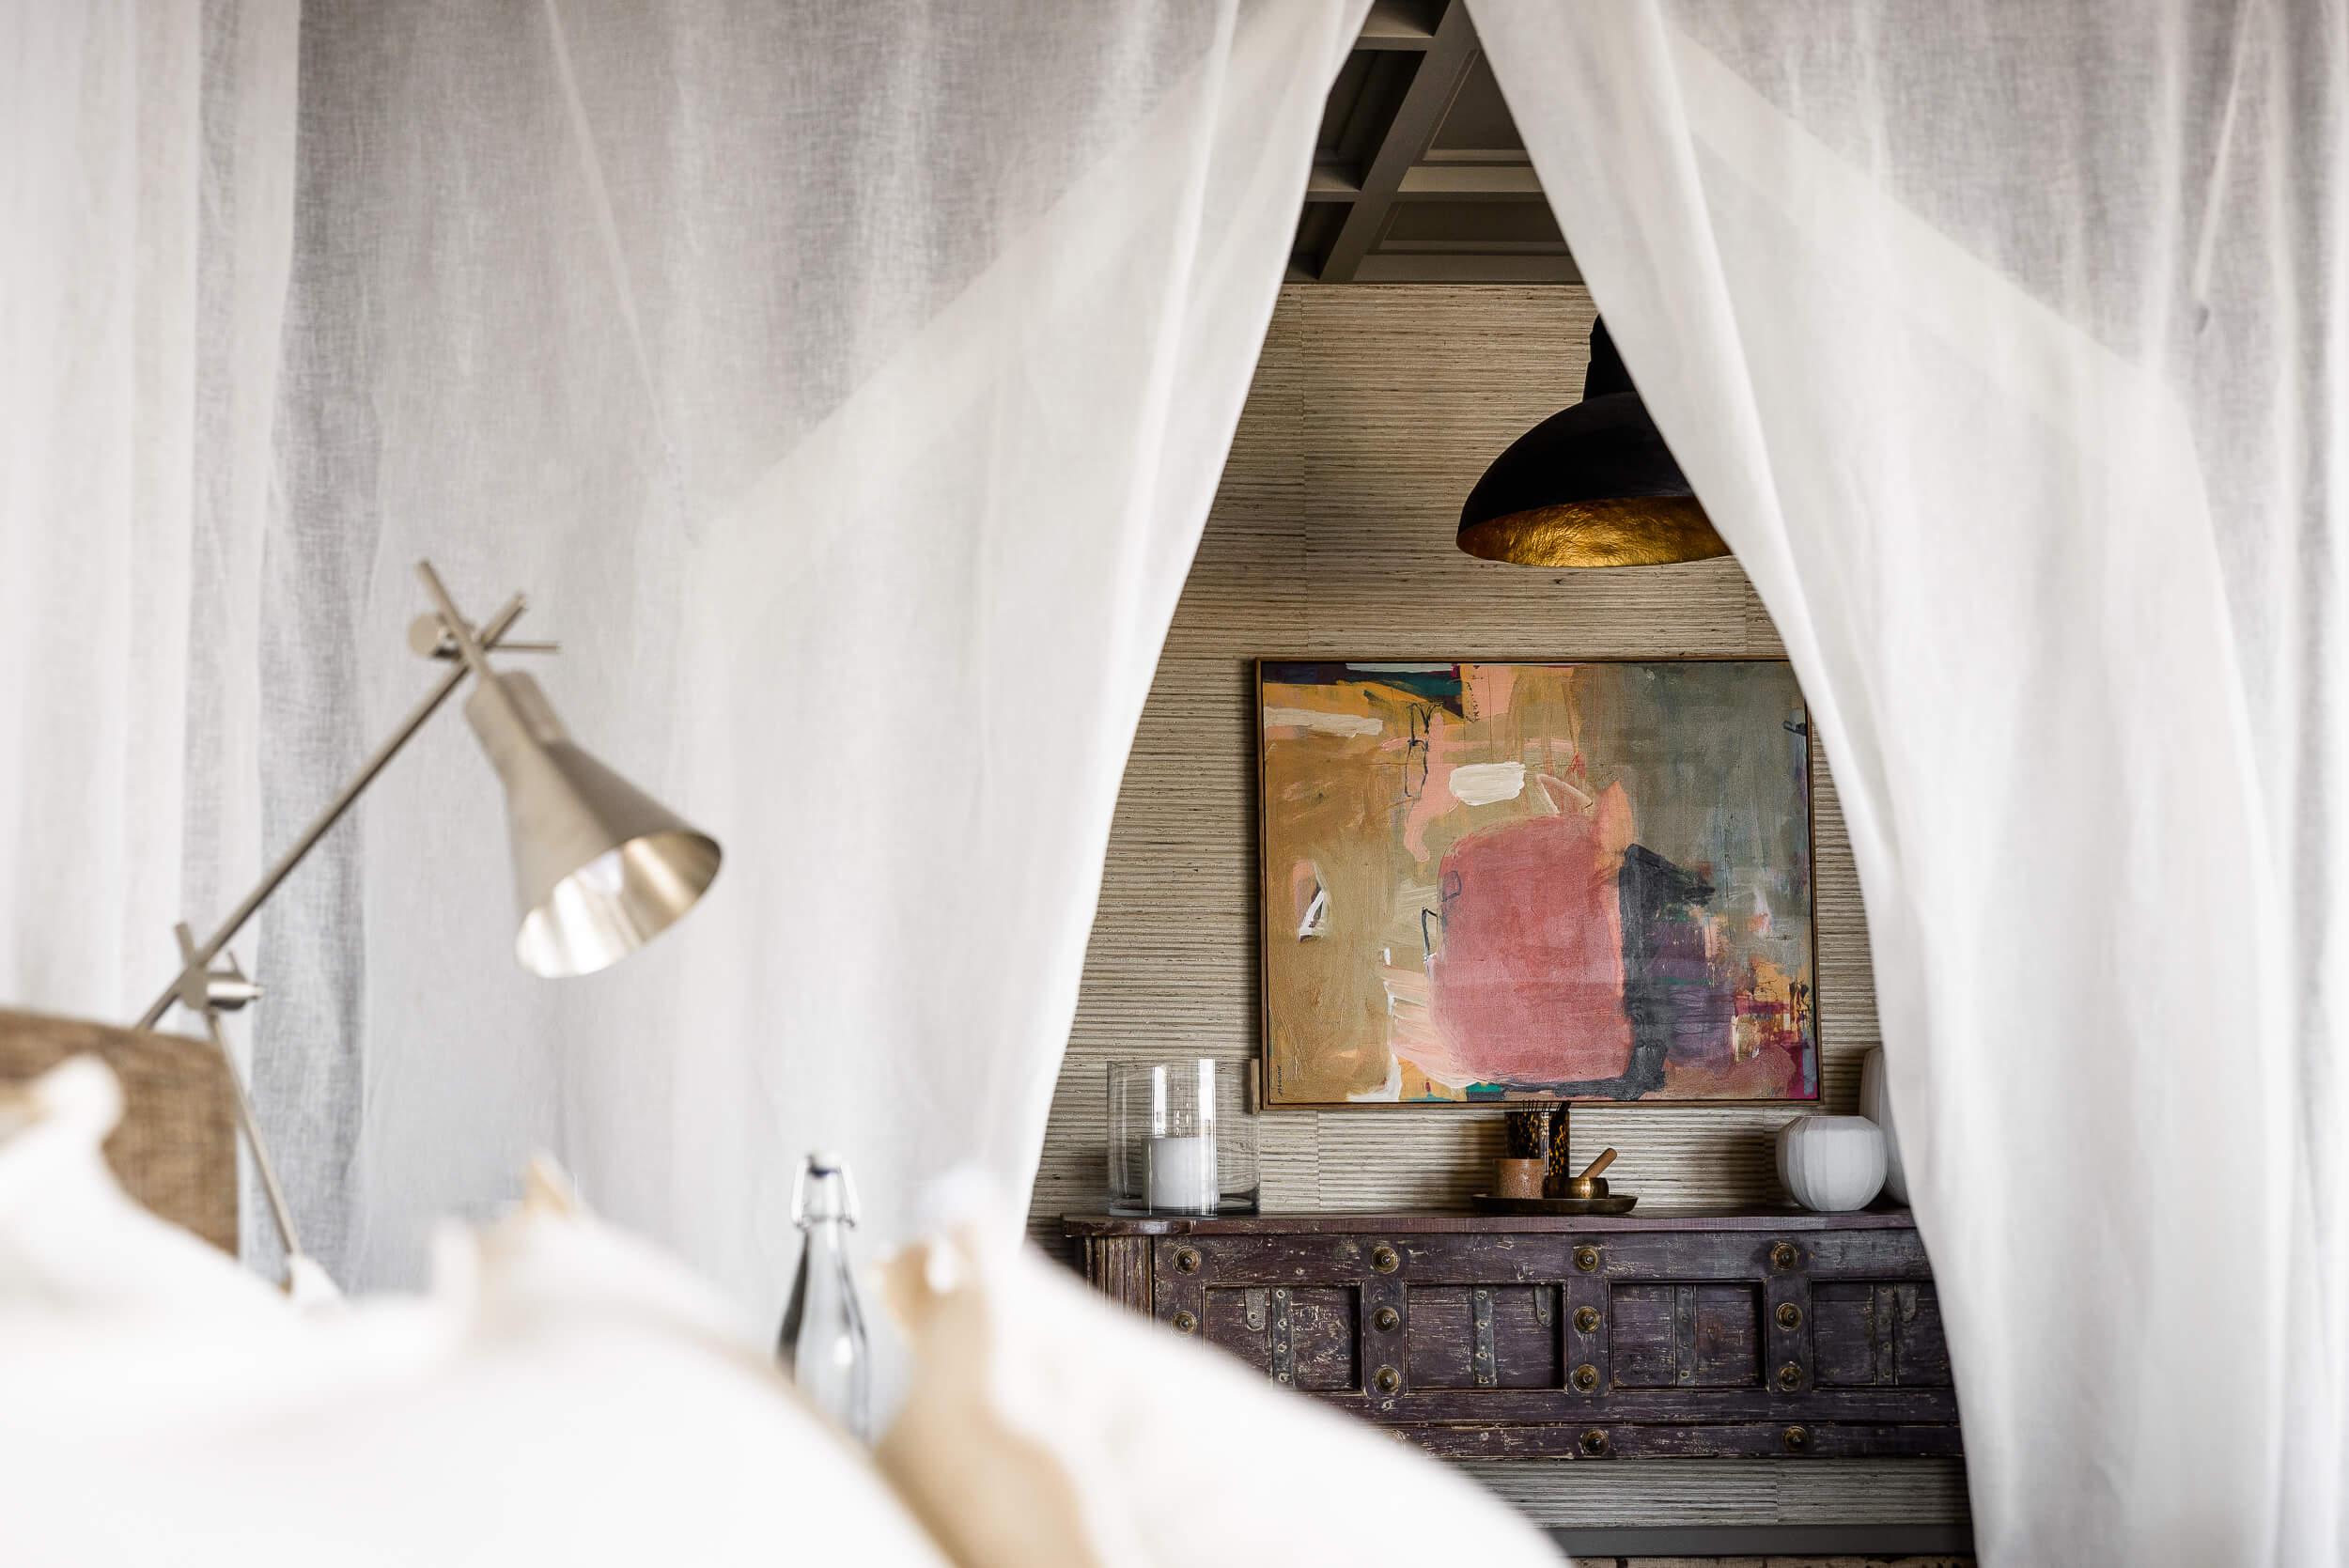 Hillside-Suite-Singita-Sasakwa-Lodge-Bed.jpg